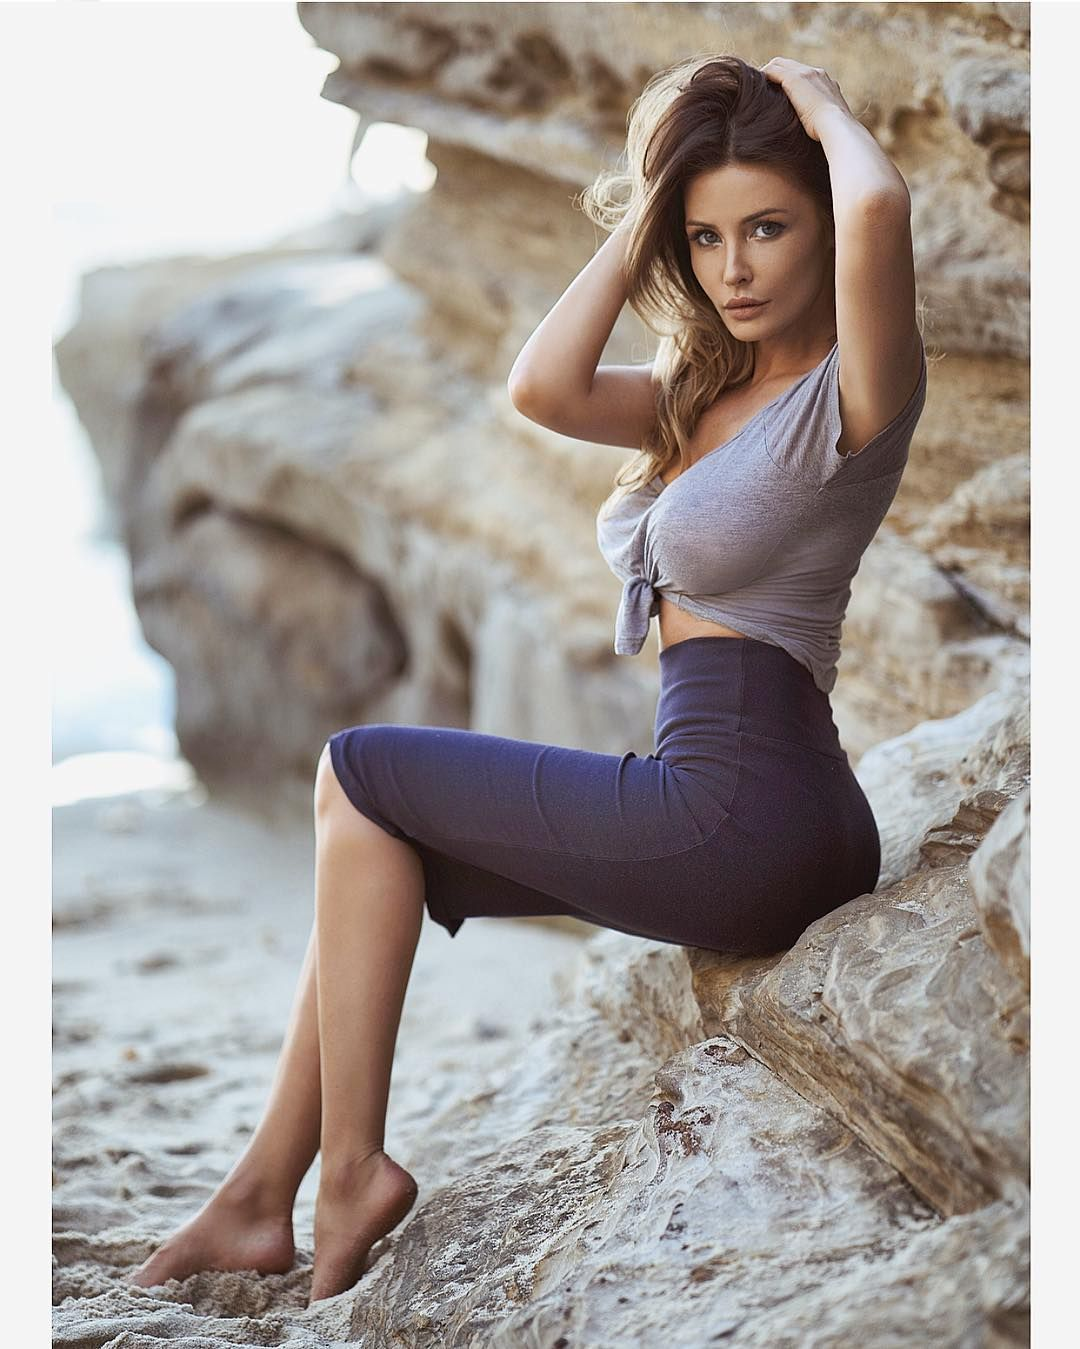 Cleavage Anyuta Rai nude (47 photos), Pussy, Is a cute, Instagram, in bikini 2015